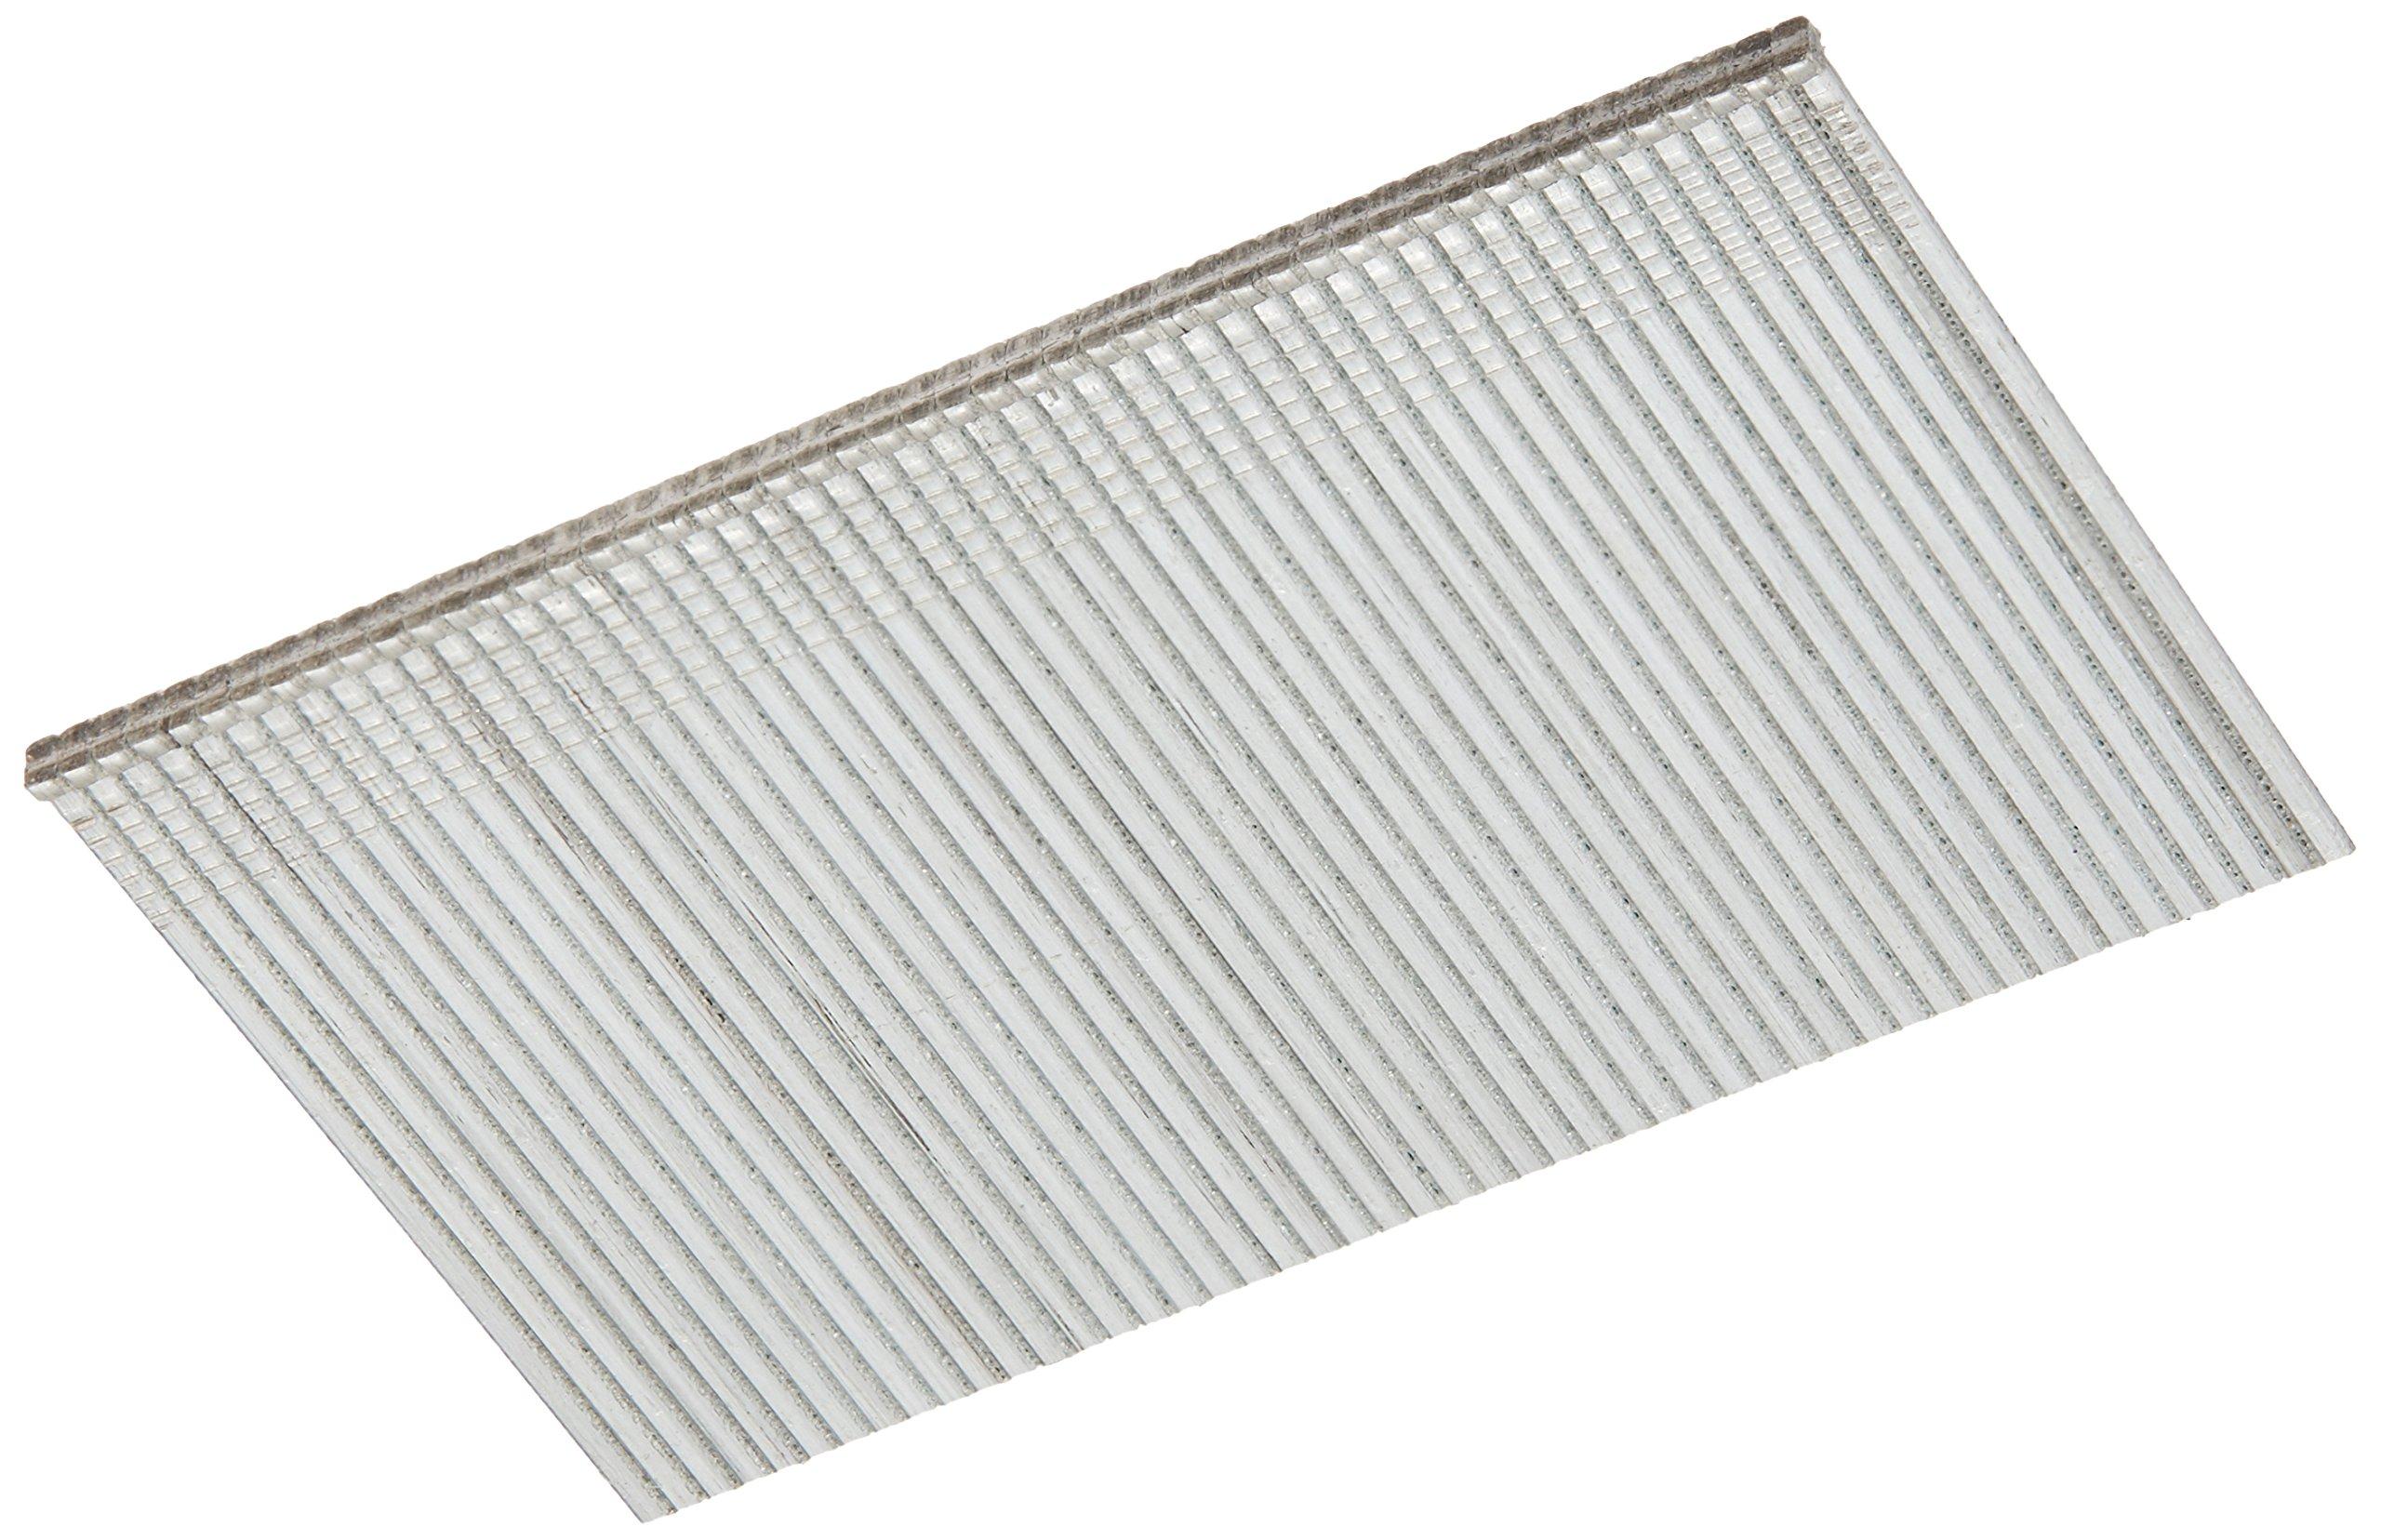 BOSTITCH SB16-2.00-1M 2-Inch by 16 Gauge Bright Finish Nail (1,000 per Box)